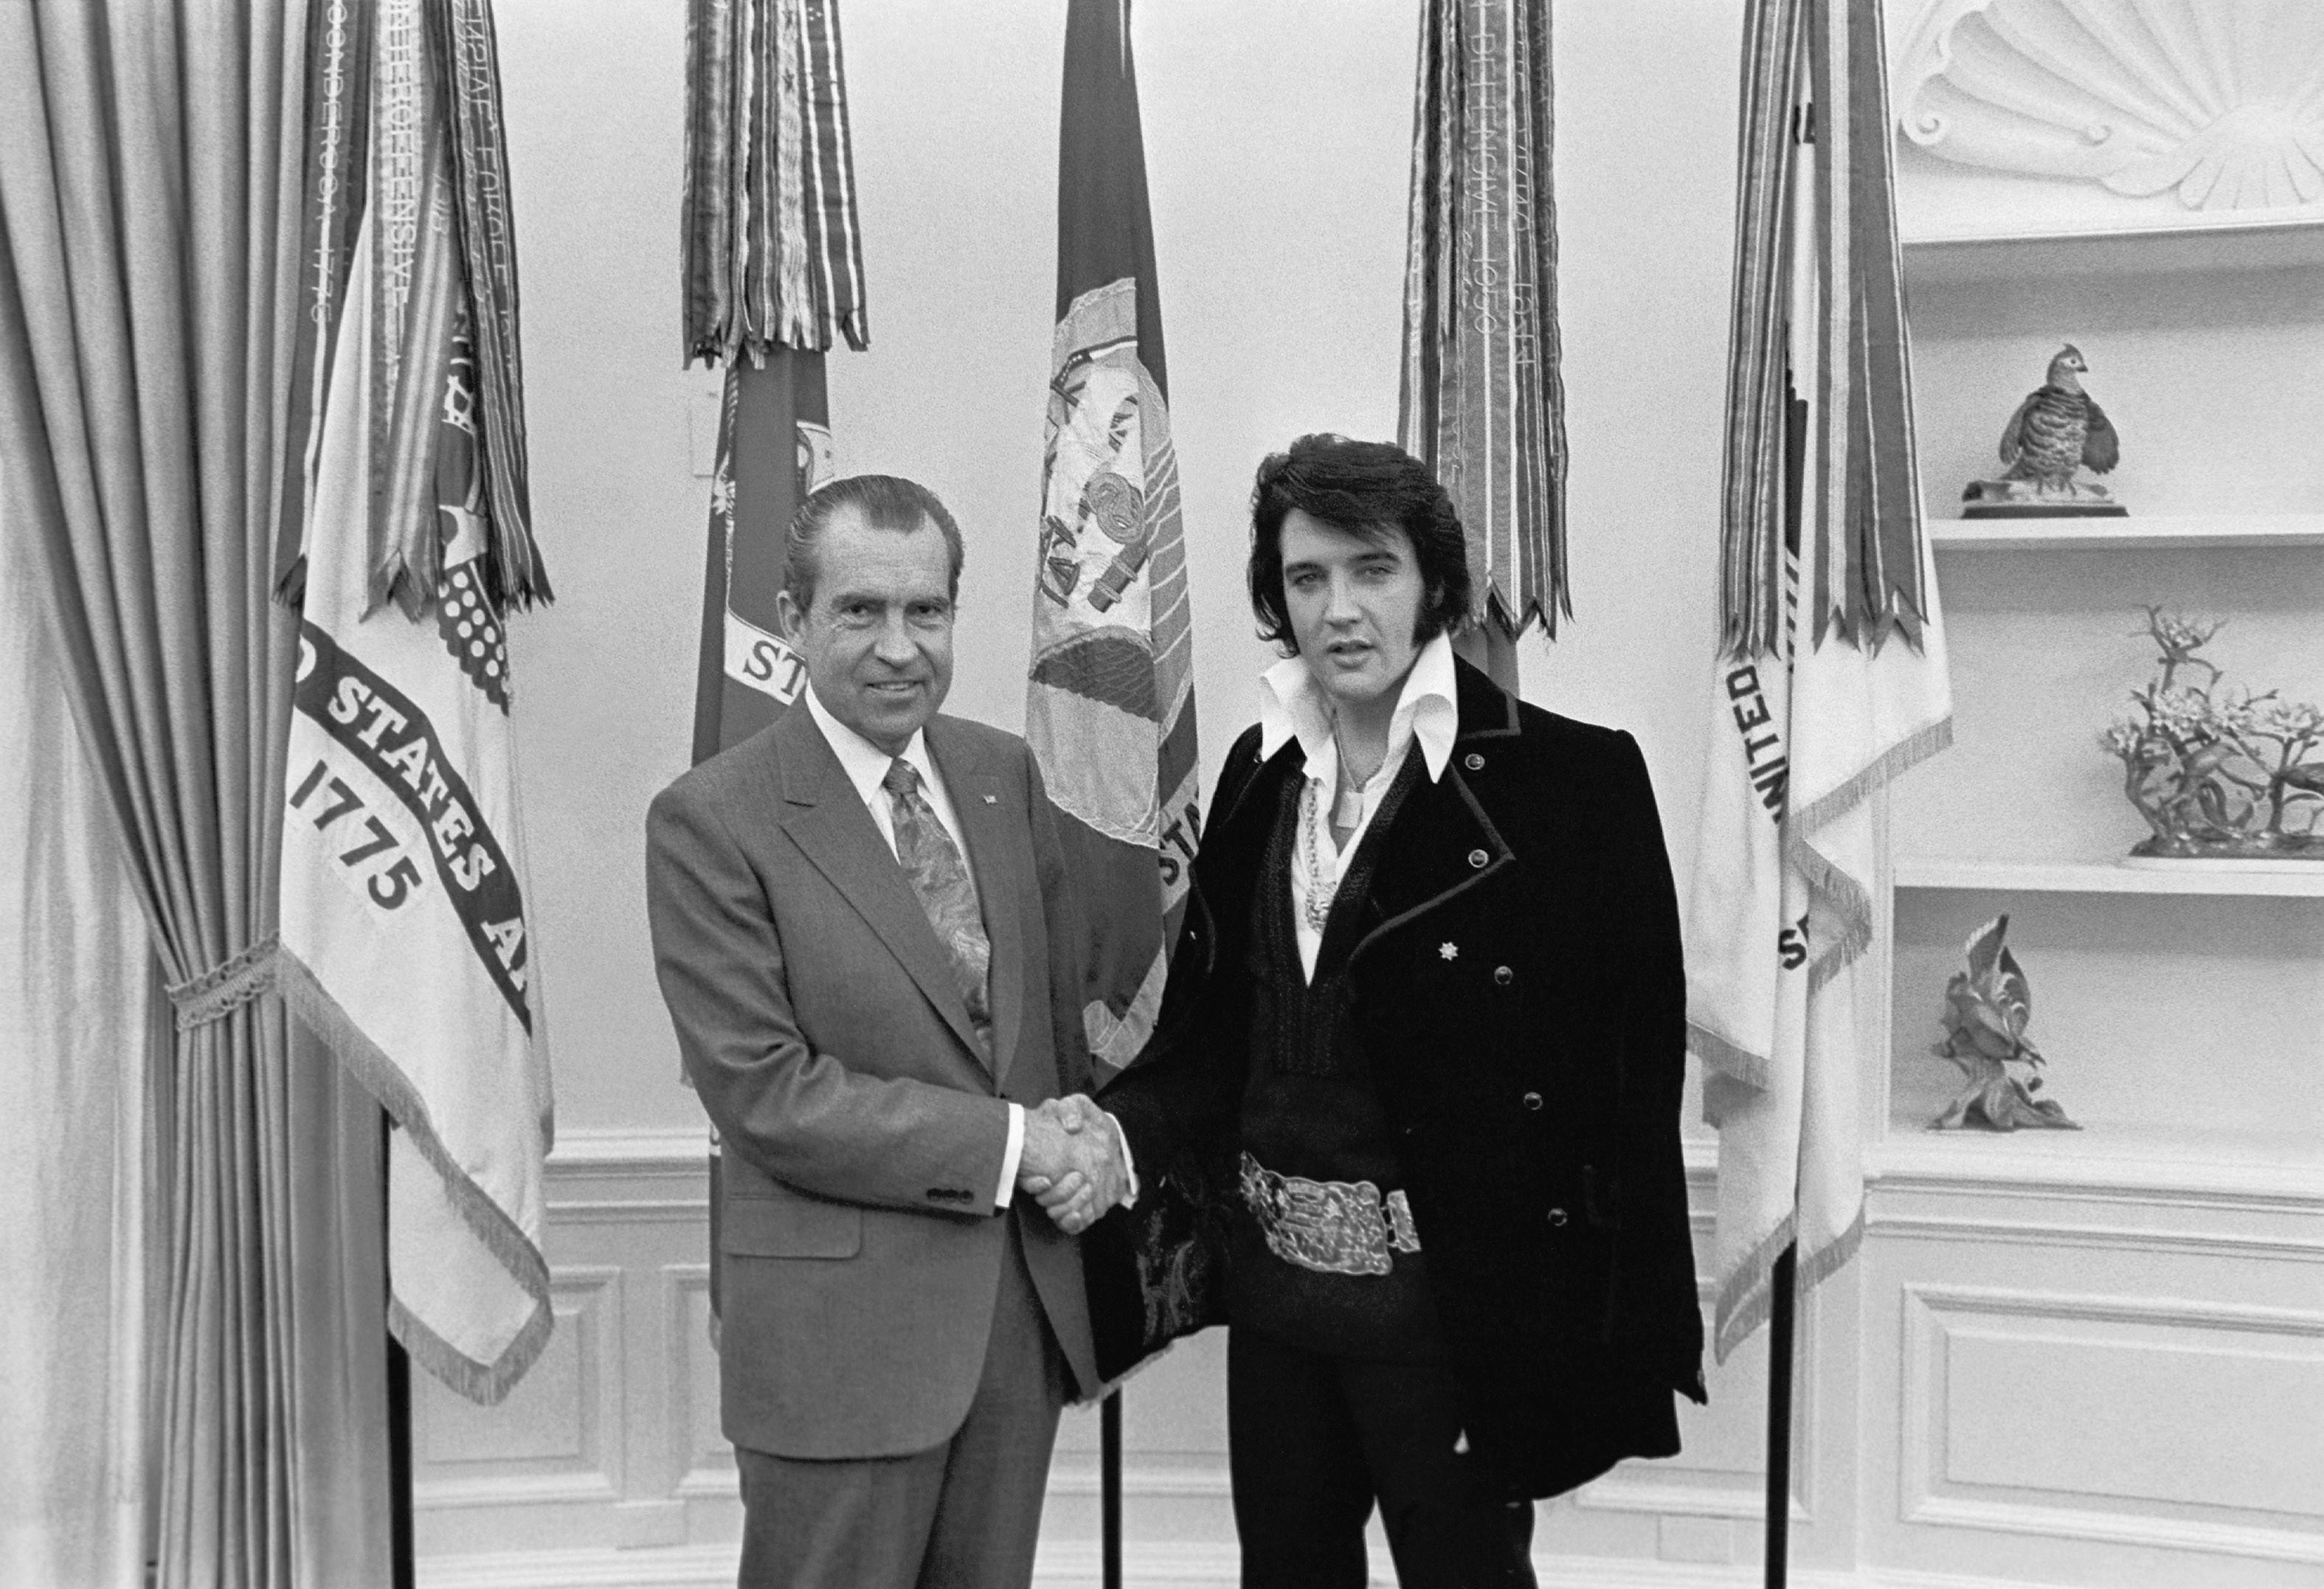 Elvis-and-Nixon-historical